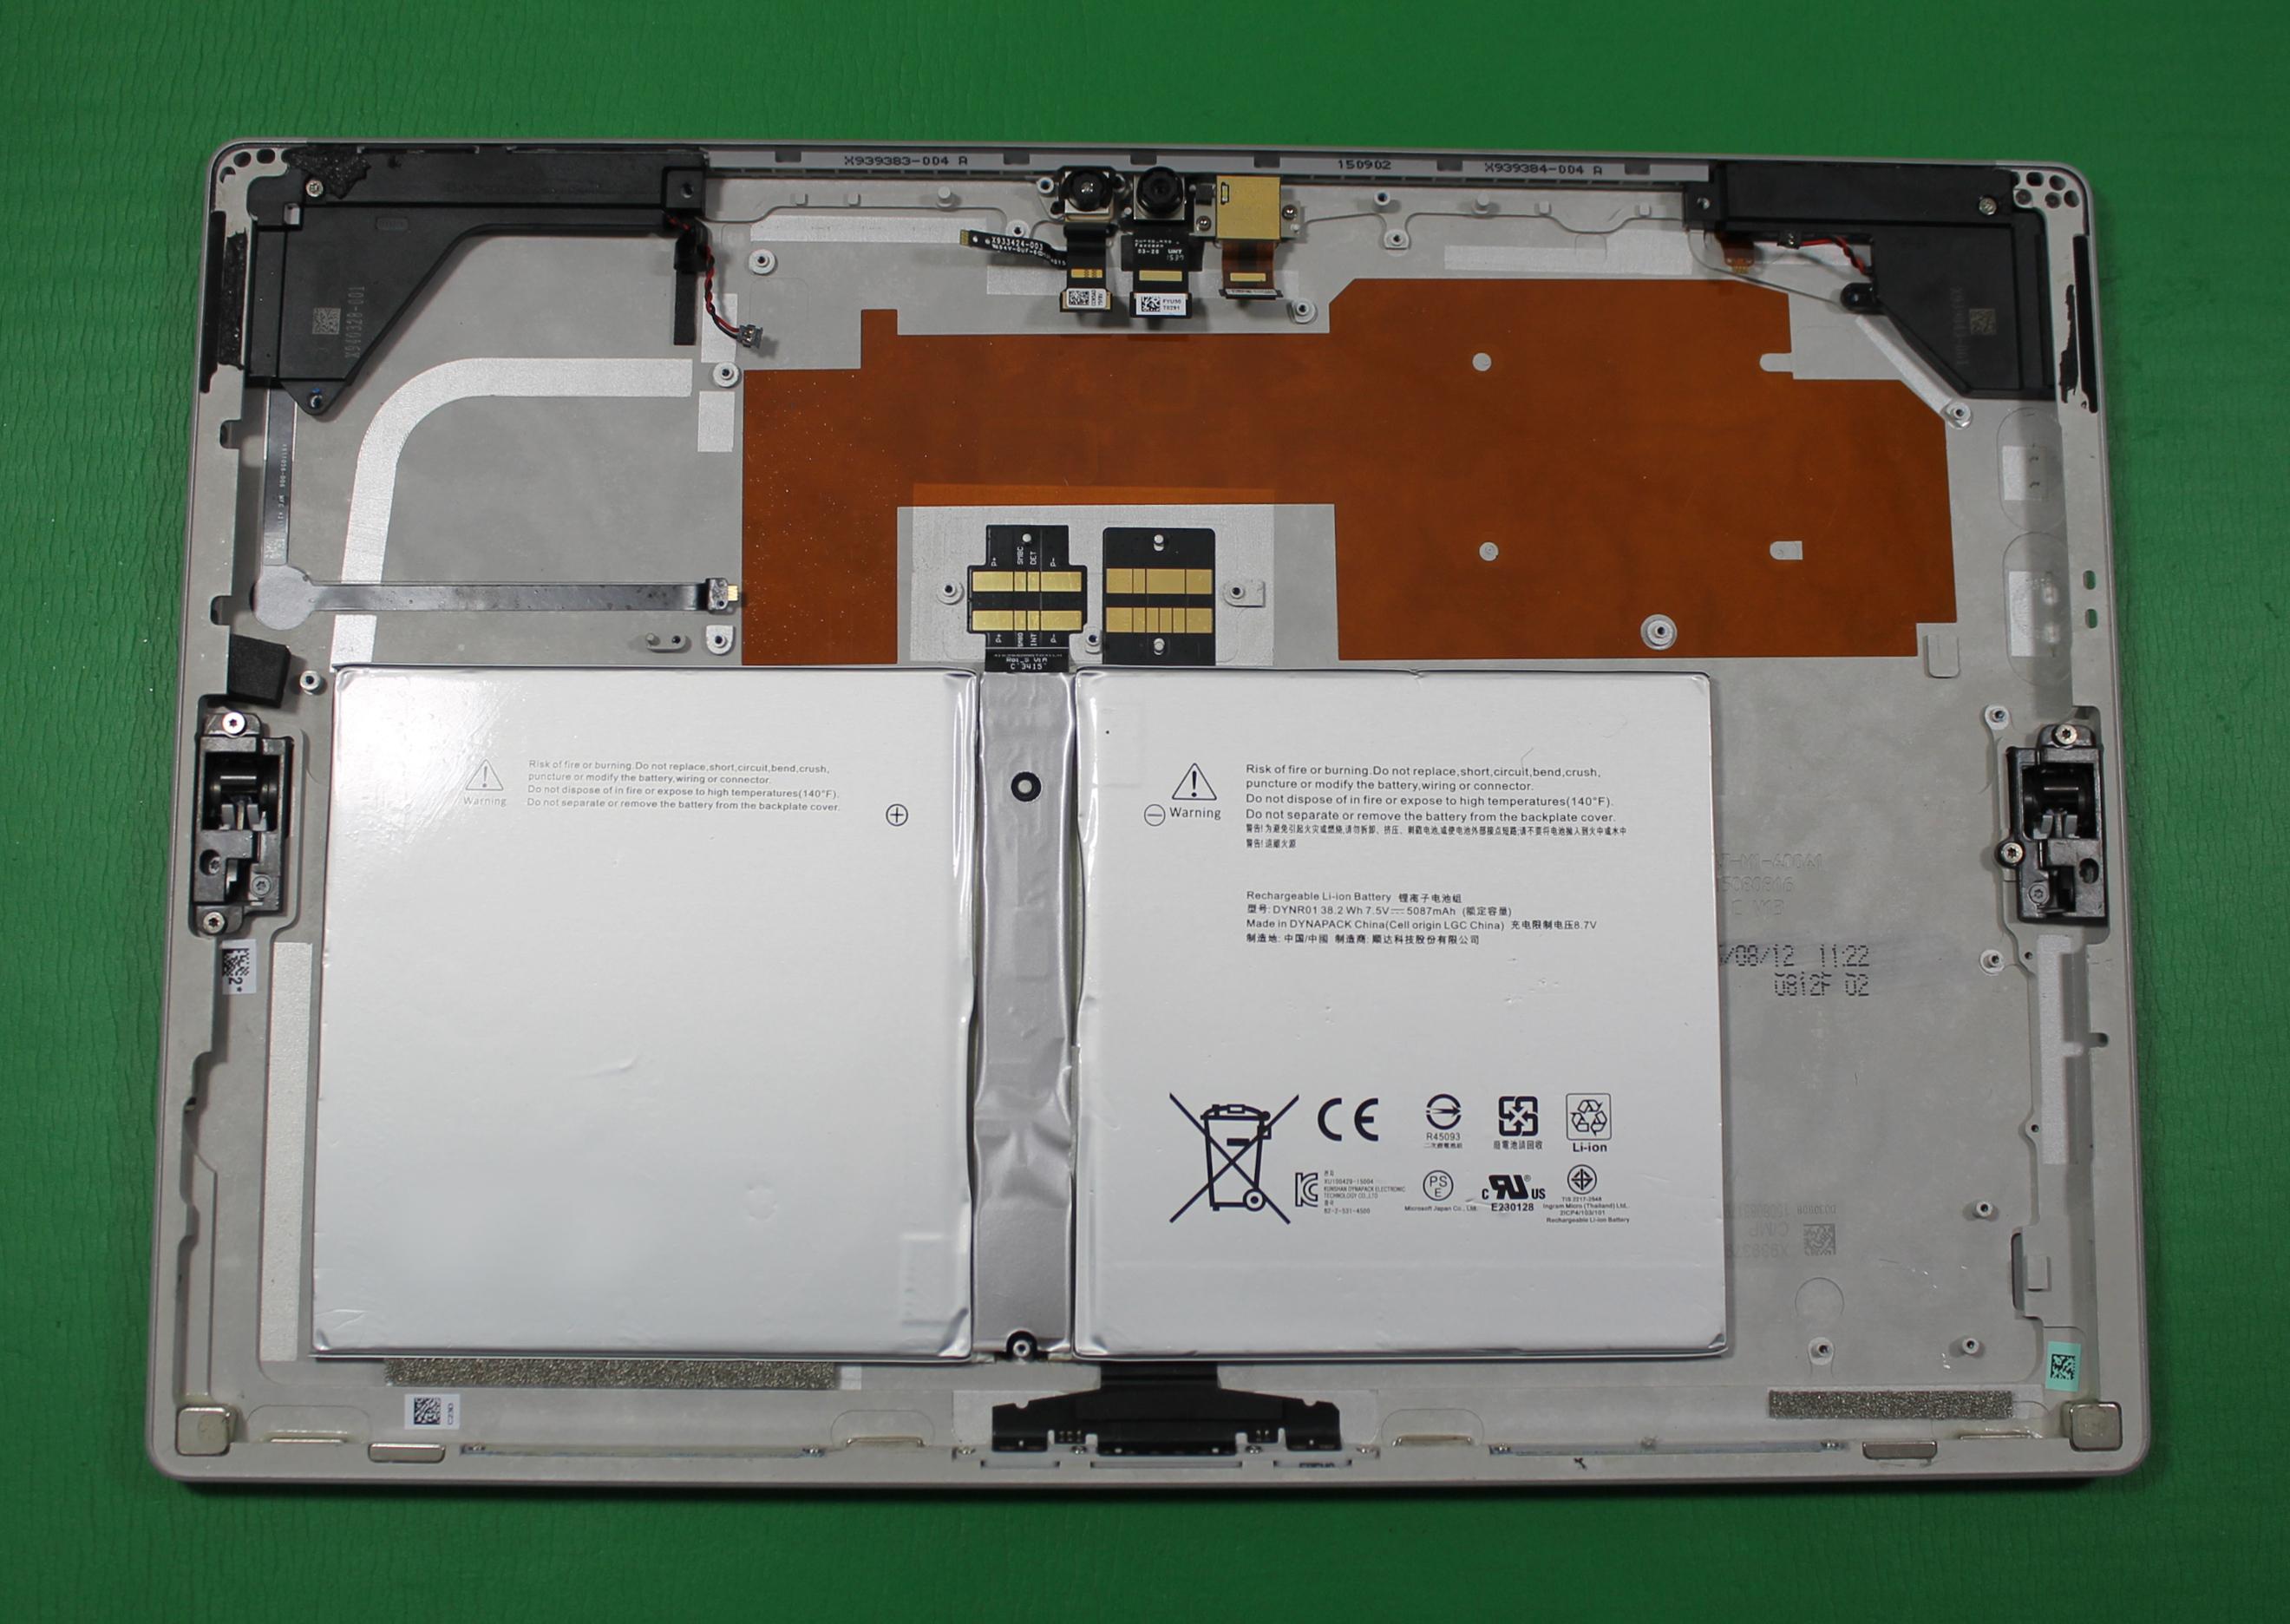 microsoft surface pro 4 1724 128gb battery x910528 008. Black Bedroom Furniture Sets. Home Design Ideas